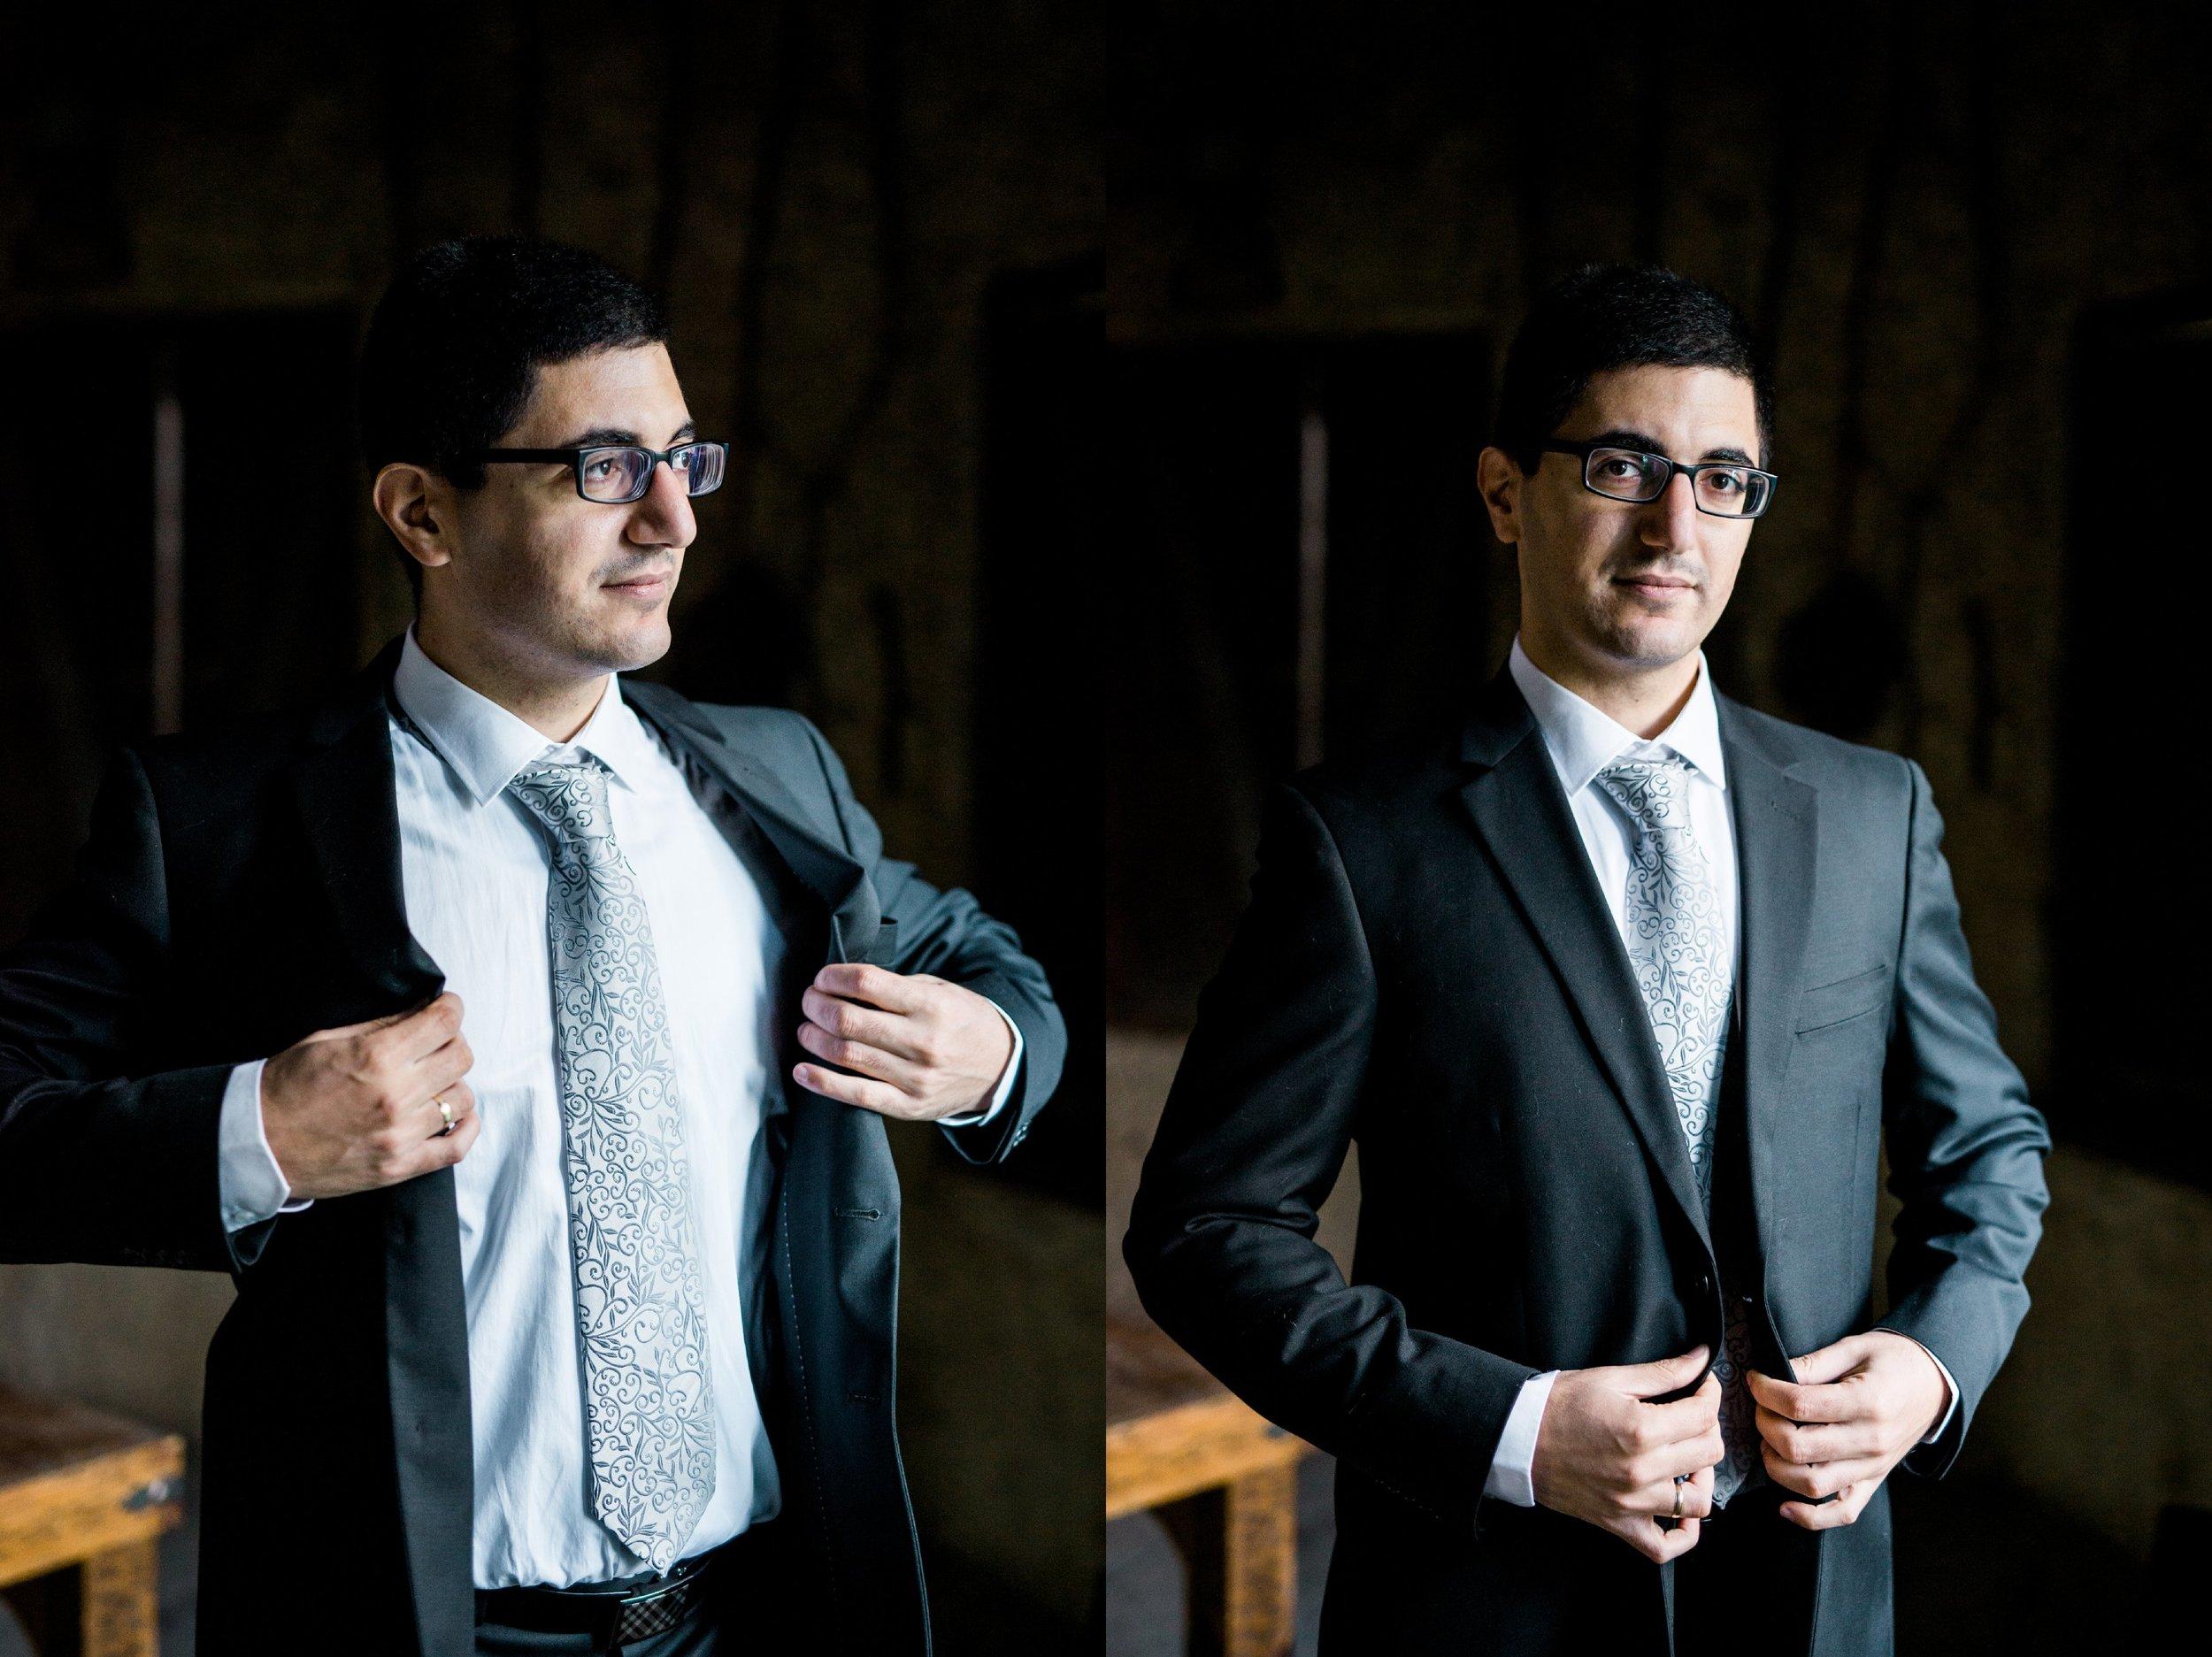 israel-garden-wedding-portraits-session-kate-giryes-photography--64_WEB.jpg